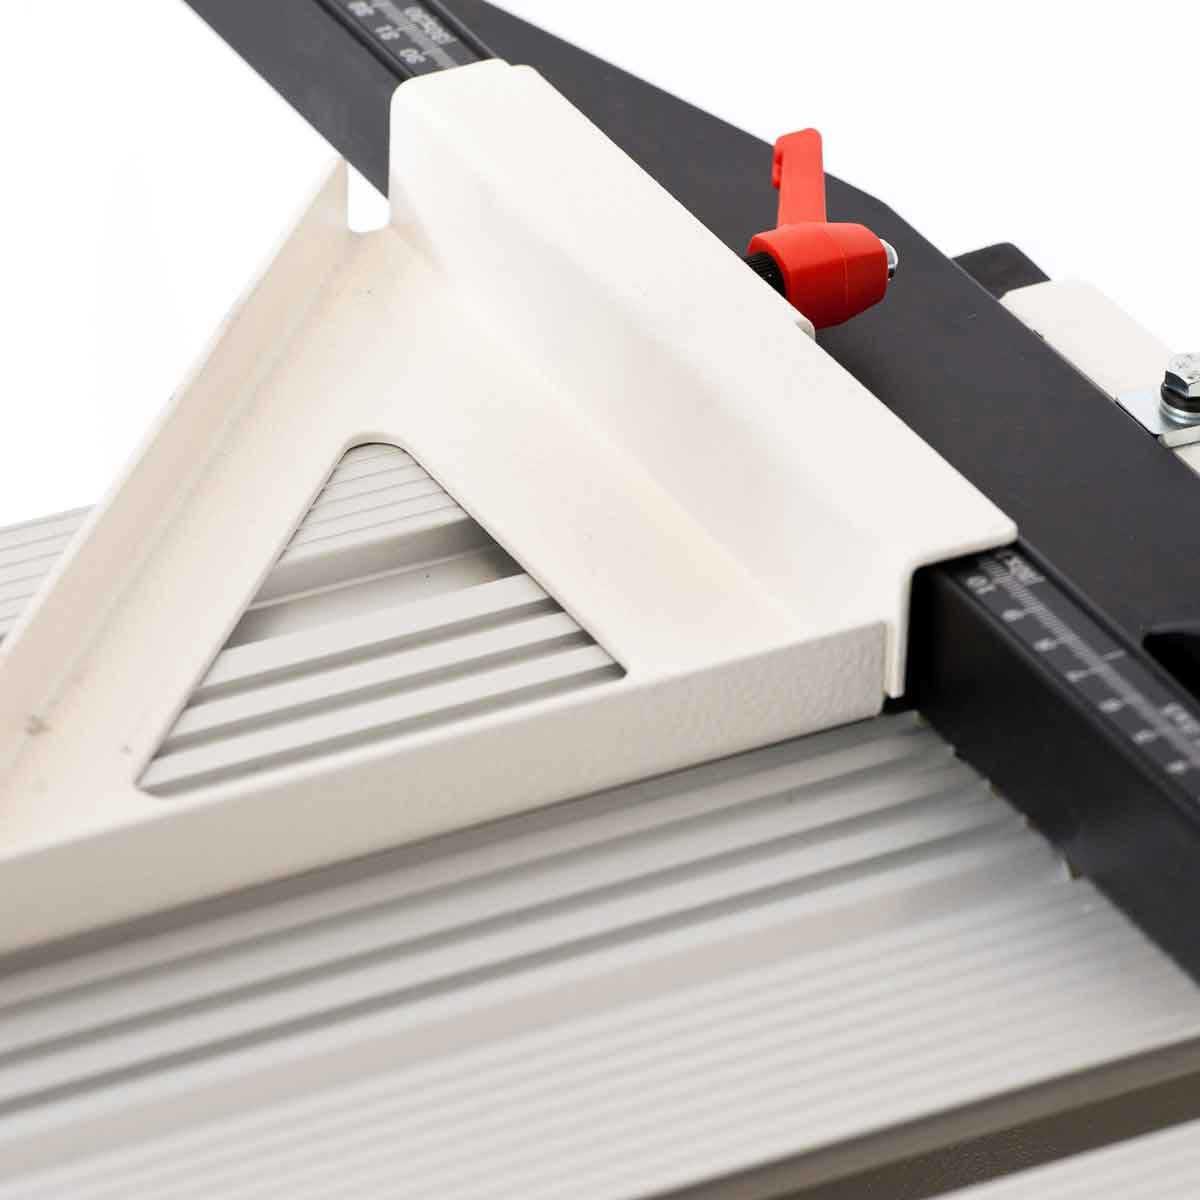 Raimondi adjustable 45 degree angle guide on rail saw